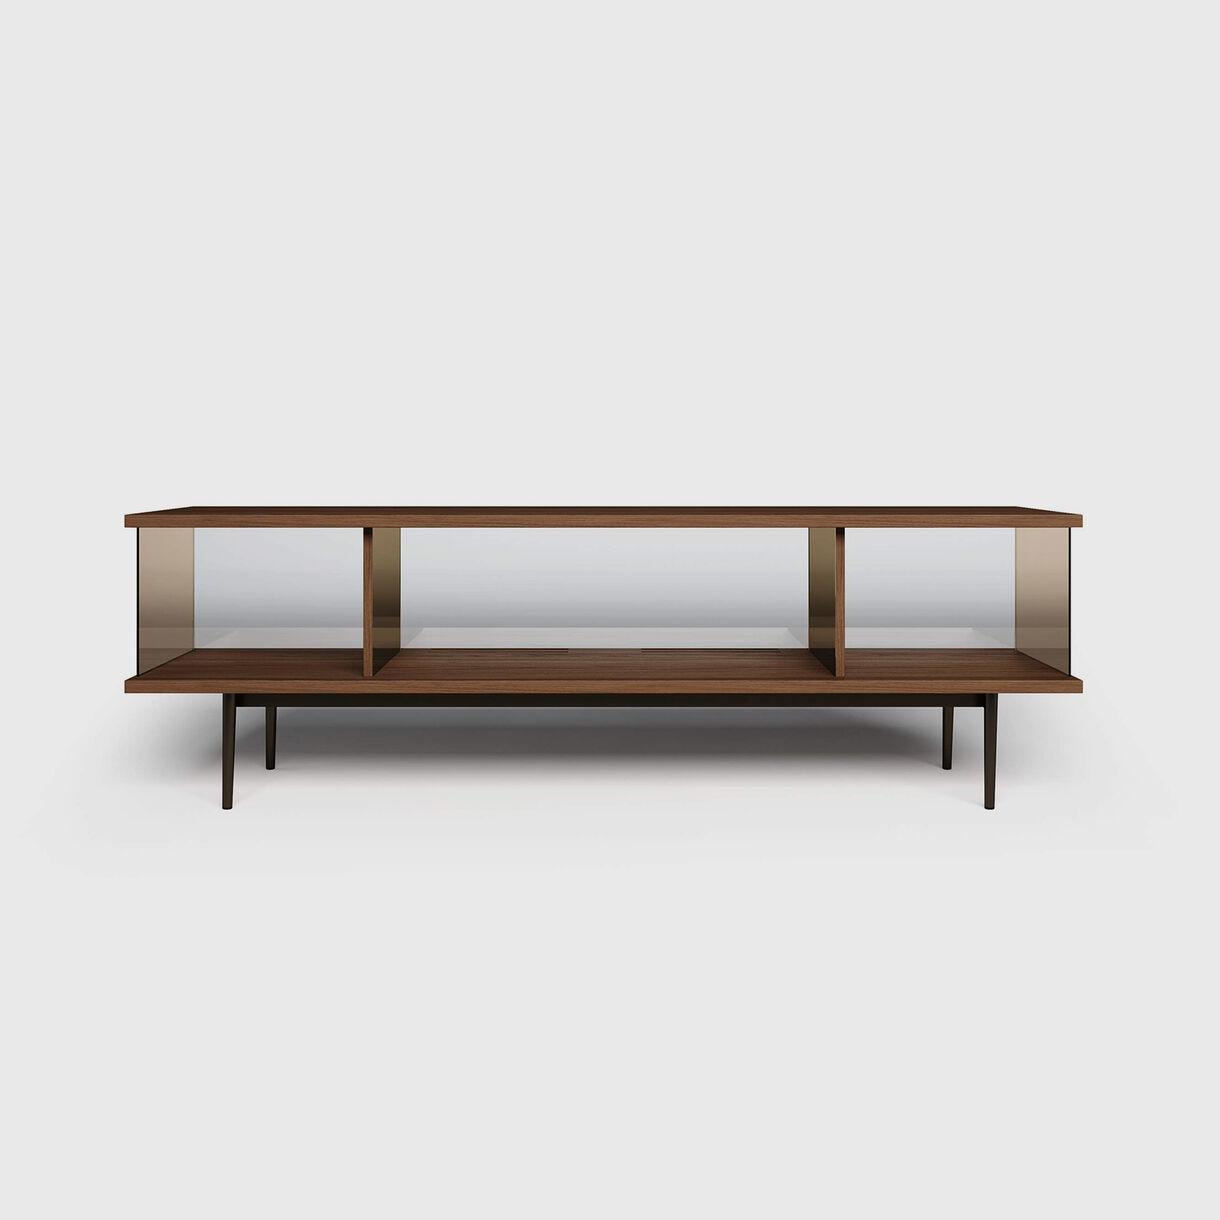 The Farns Sideboard